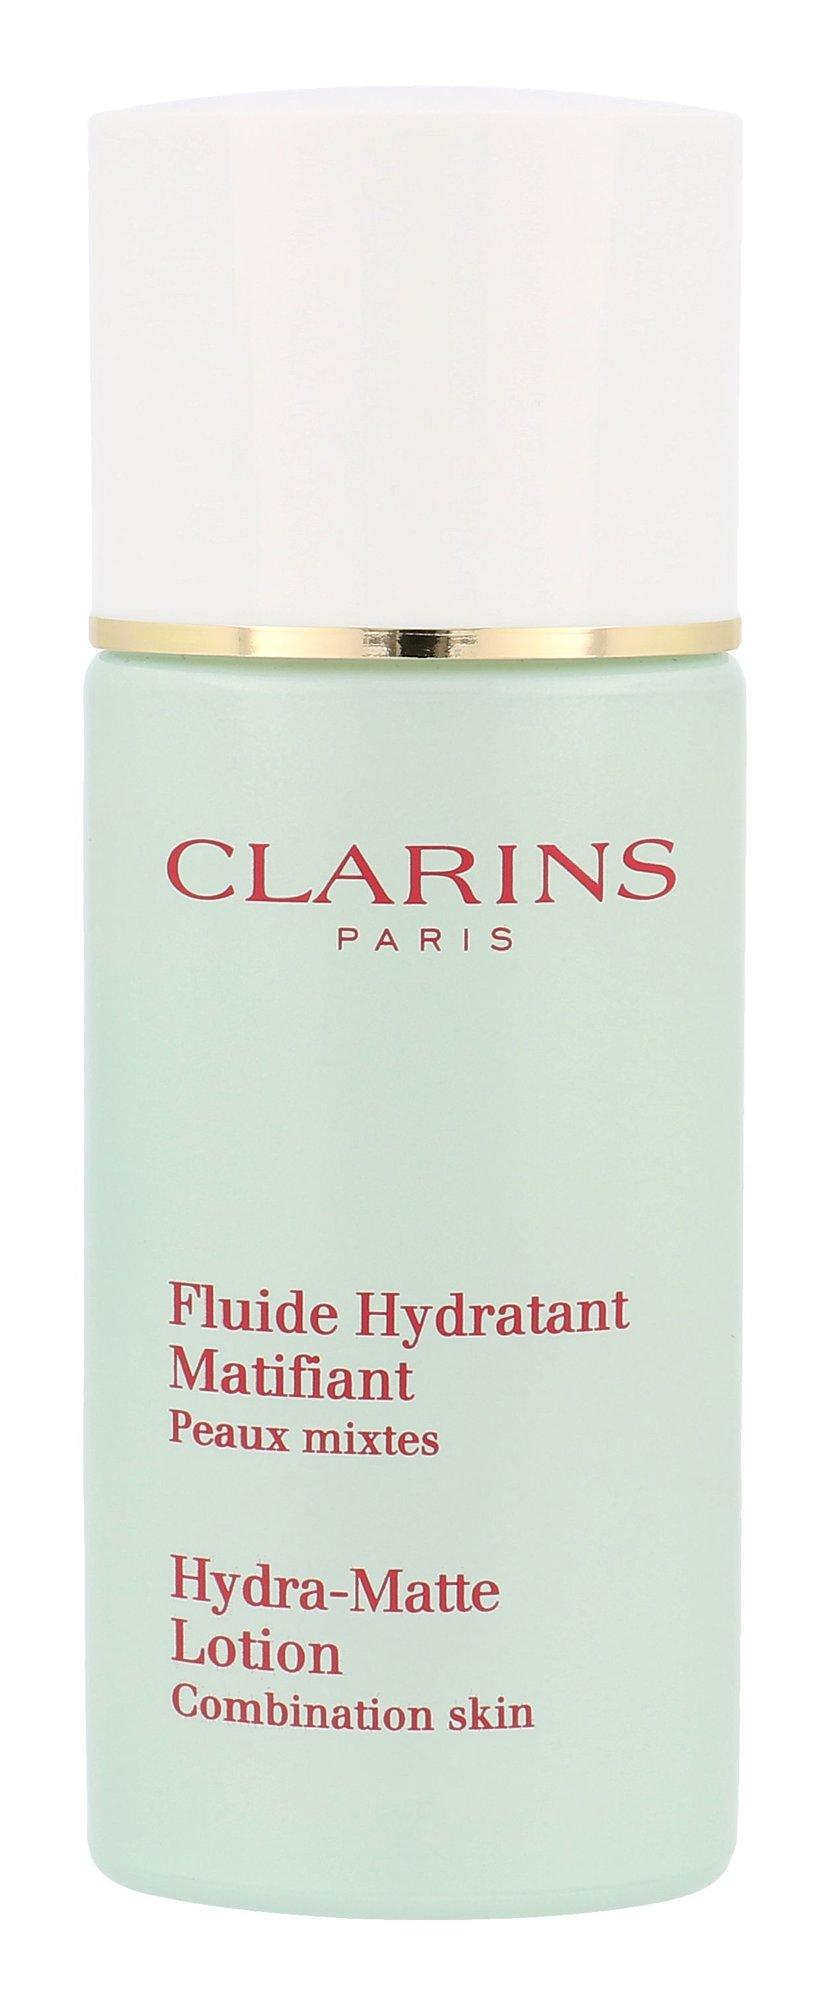 Clarins Hydra Matte Cosmetic 50ml